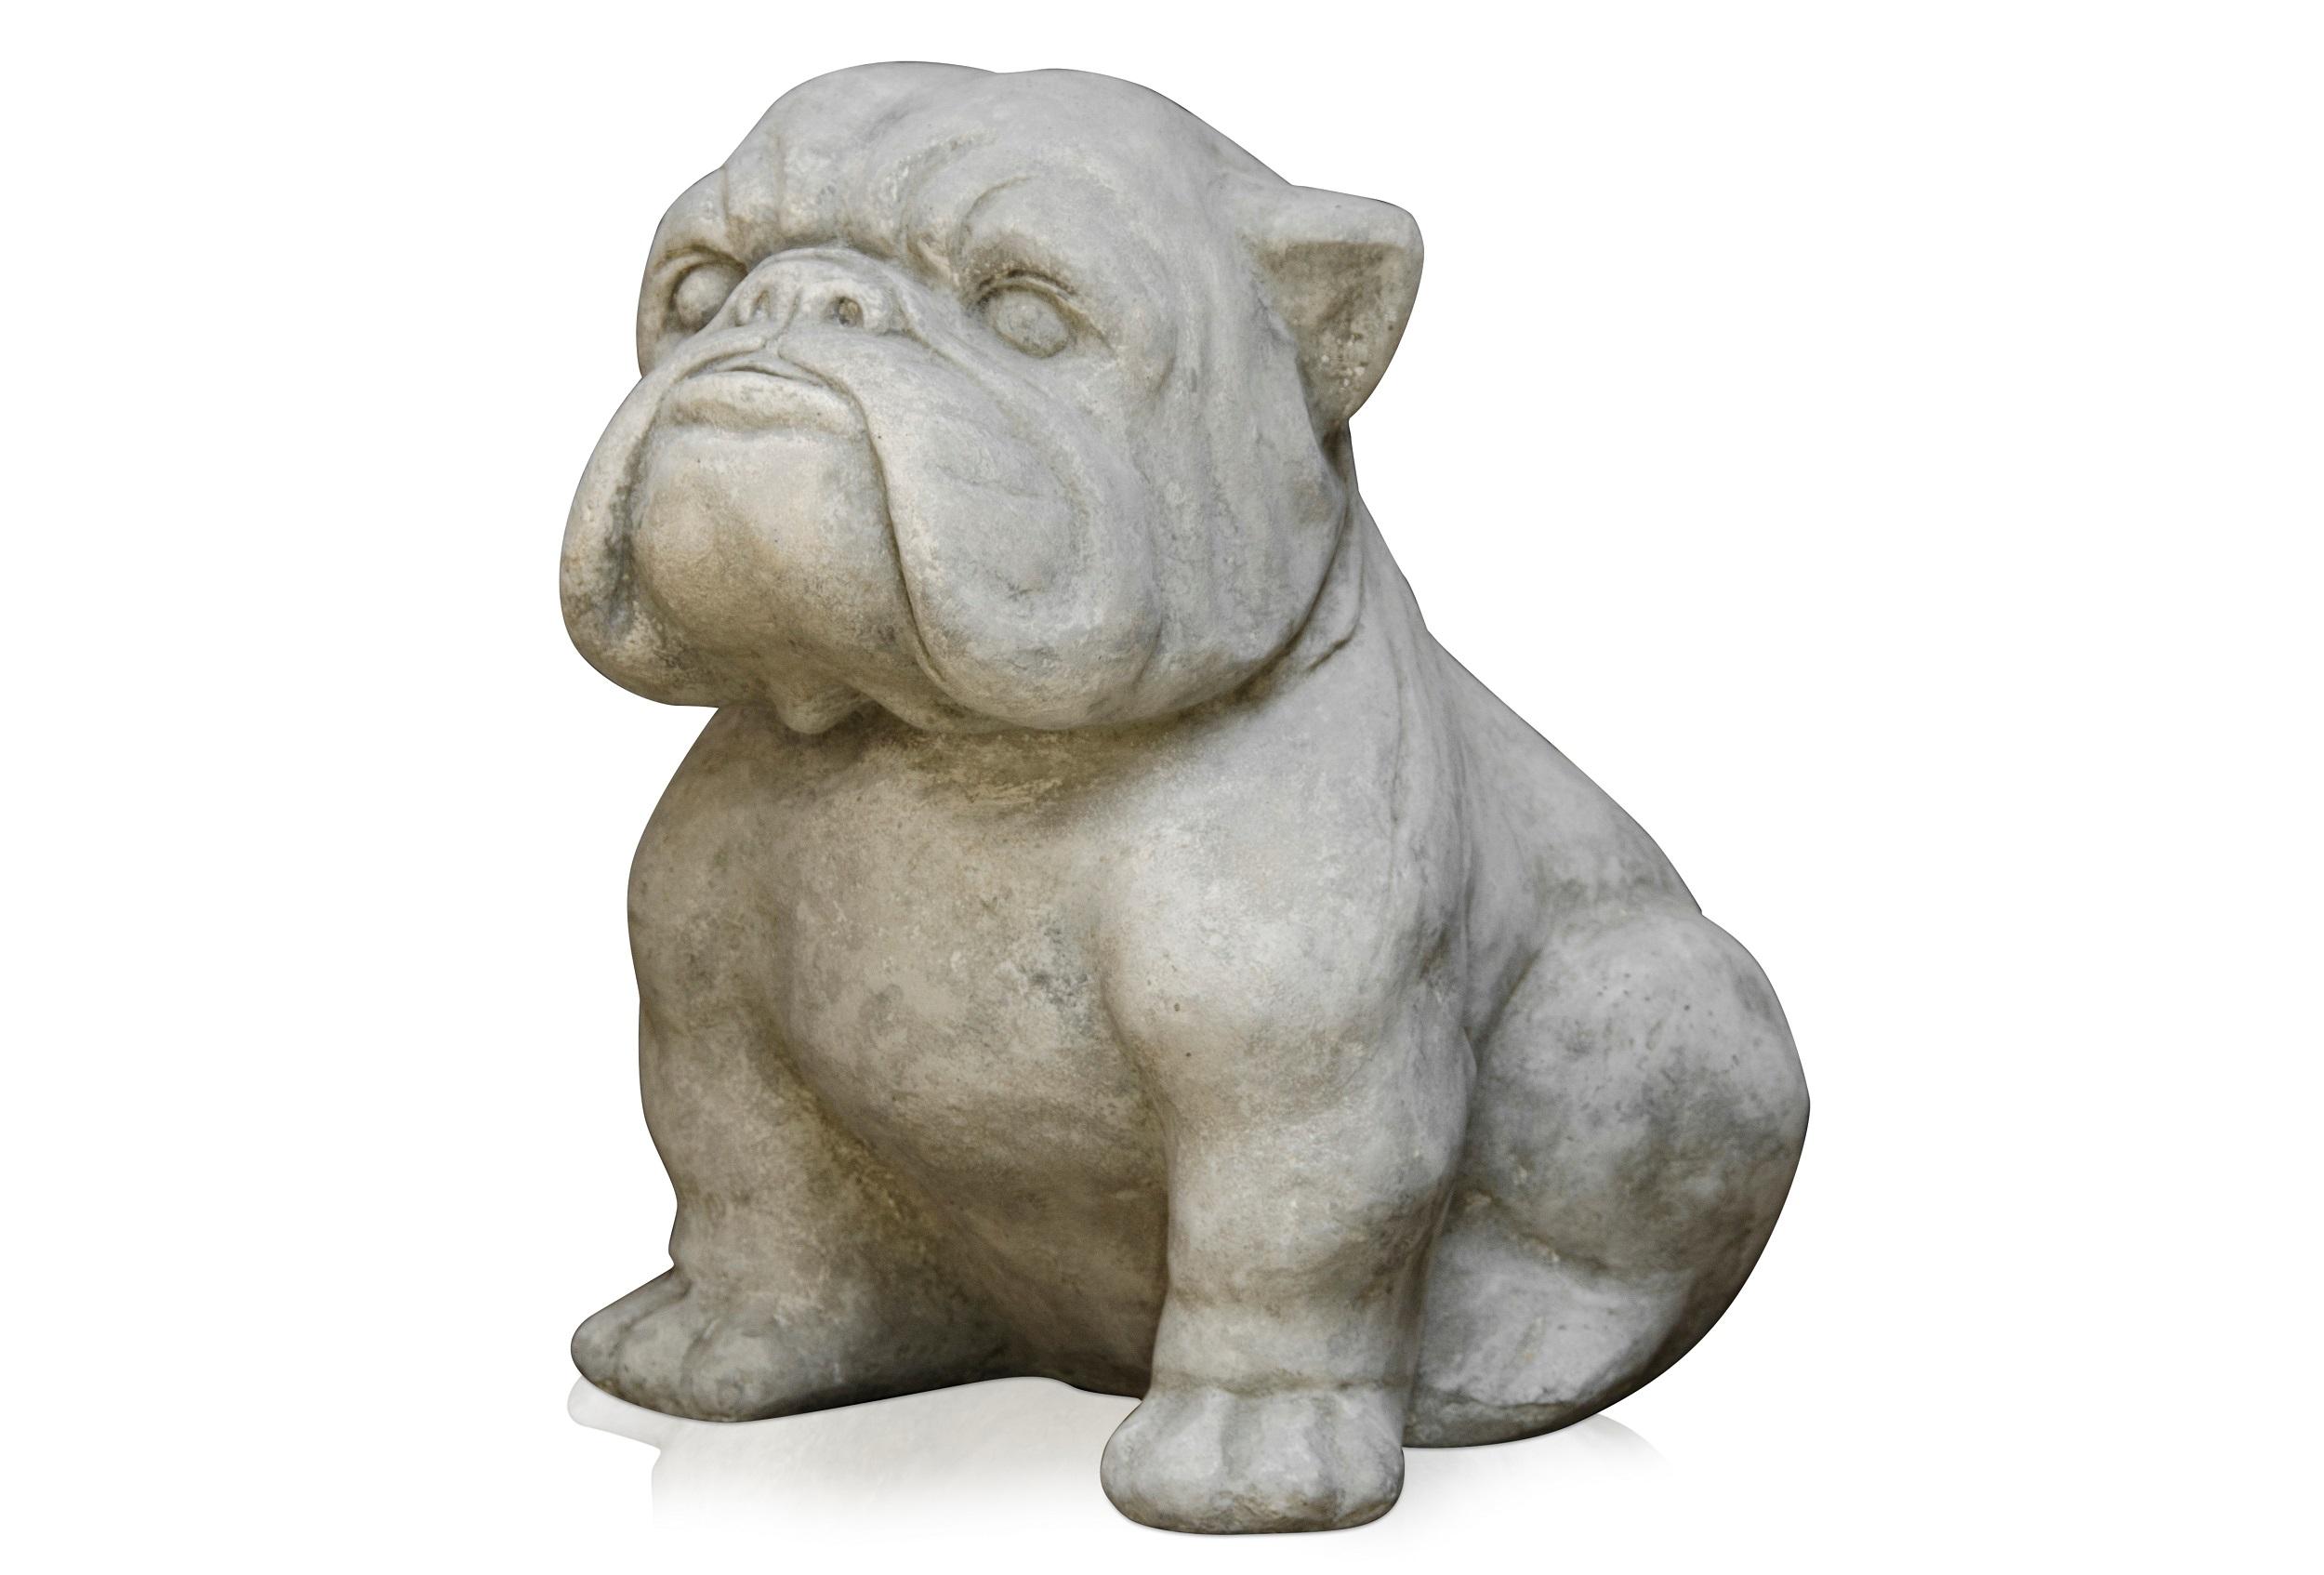 Скульптура BuldogСтатуэтки<br>Скульптура фигура декоративная.&amp;amp;nbsp;<br><br>Material: Цемент<br>Ширина см: 44<br>Высота см: 31<br>Глубина см: 41